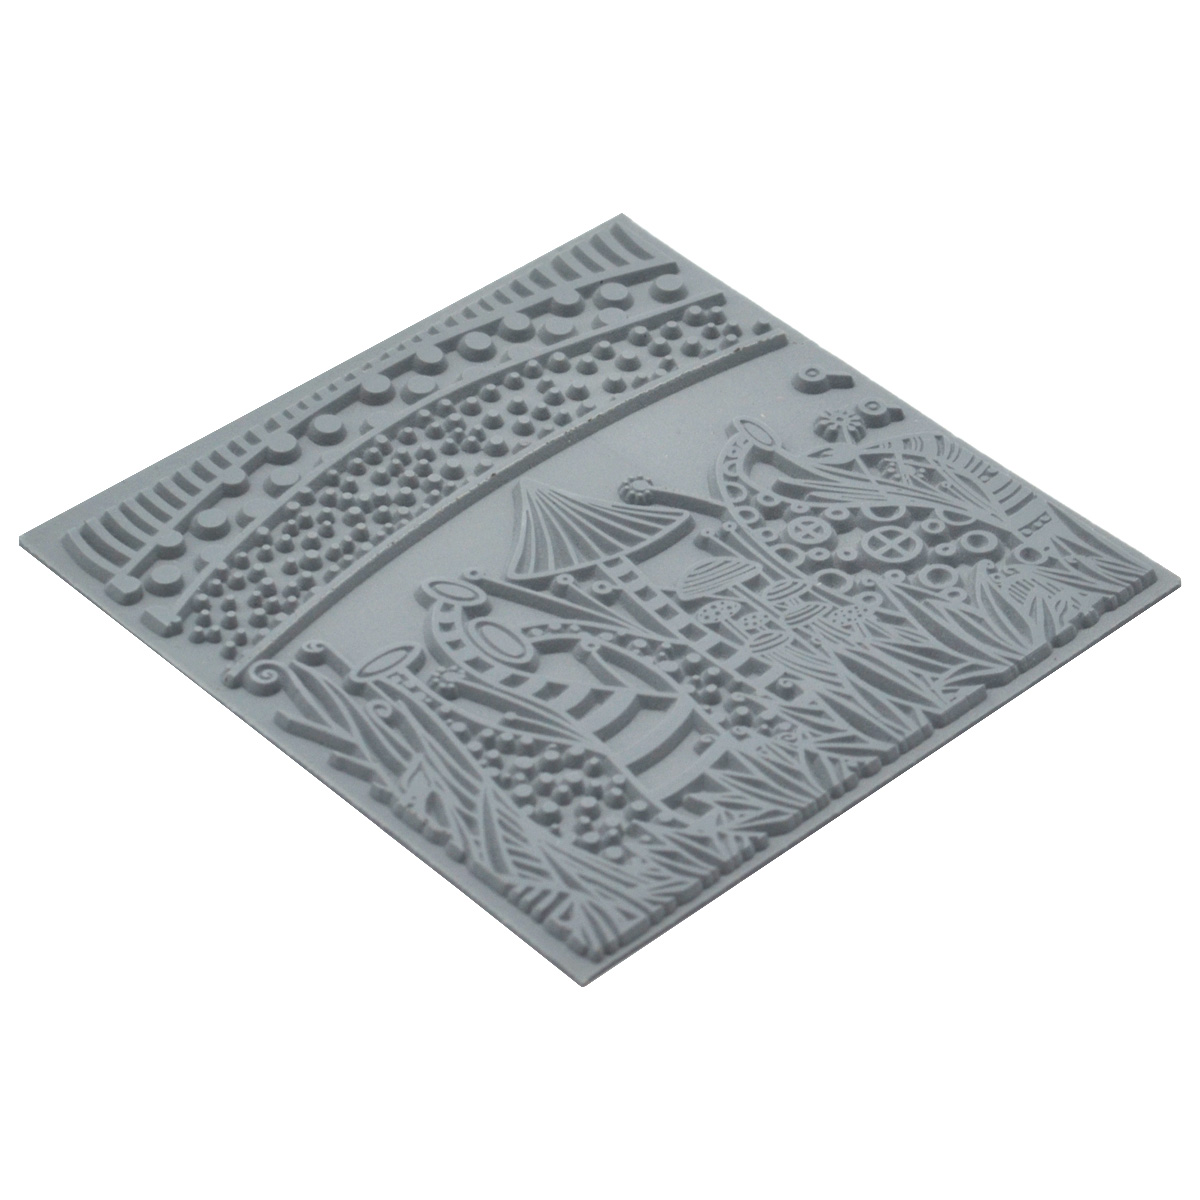 CE95020 Текстура для пластики резиновая 'Природа', 9х9 см